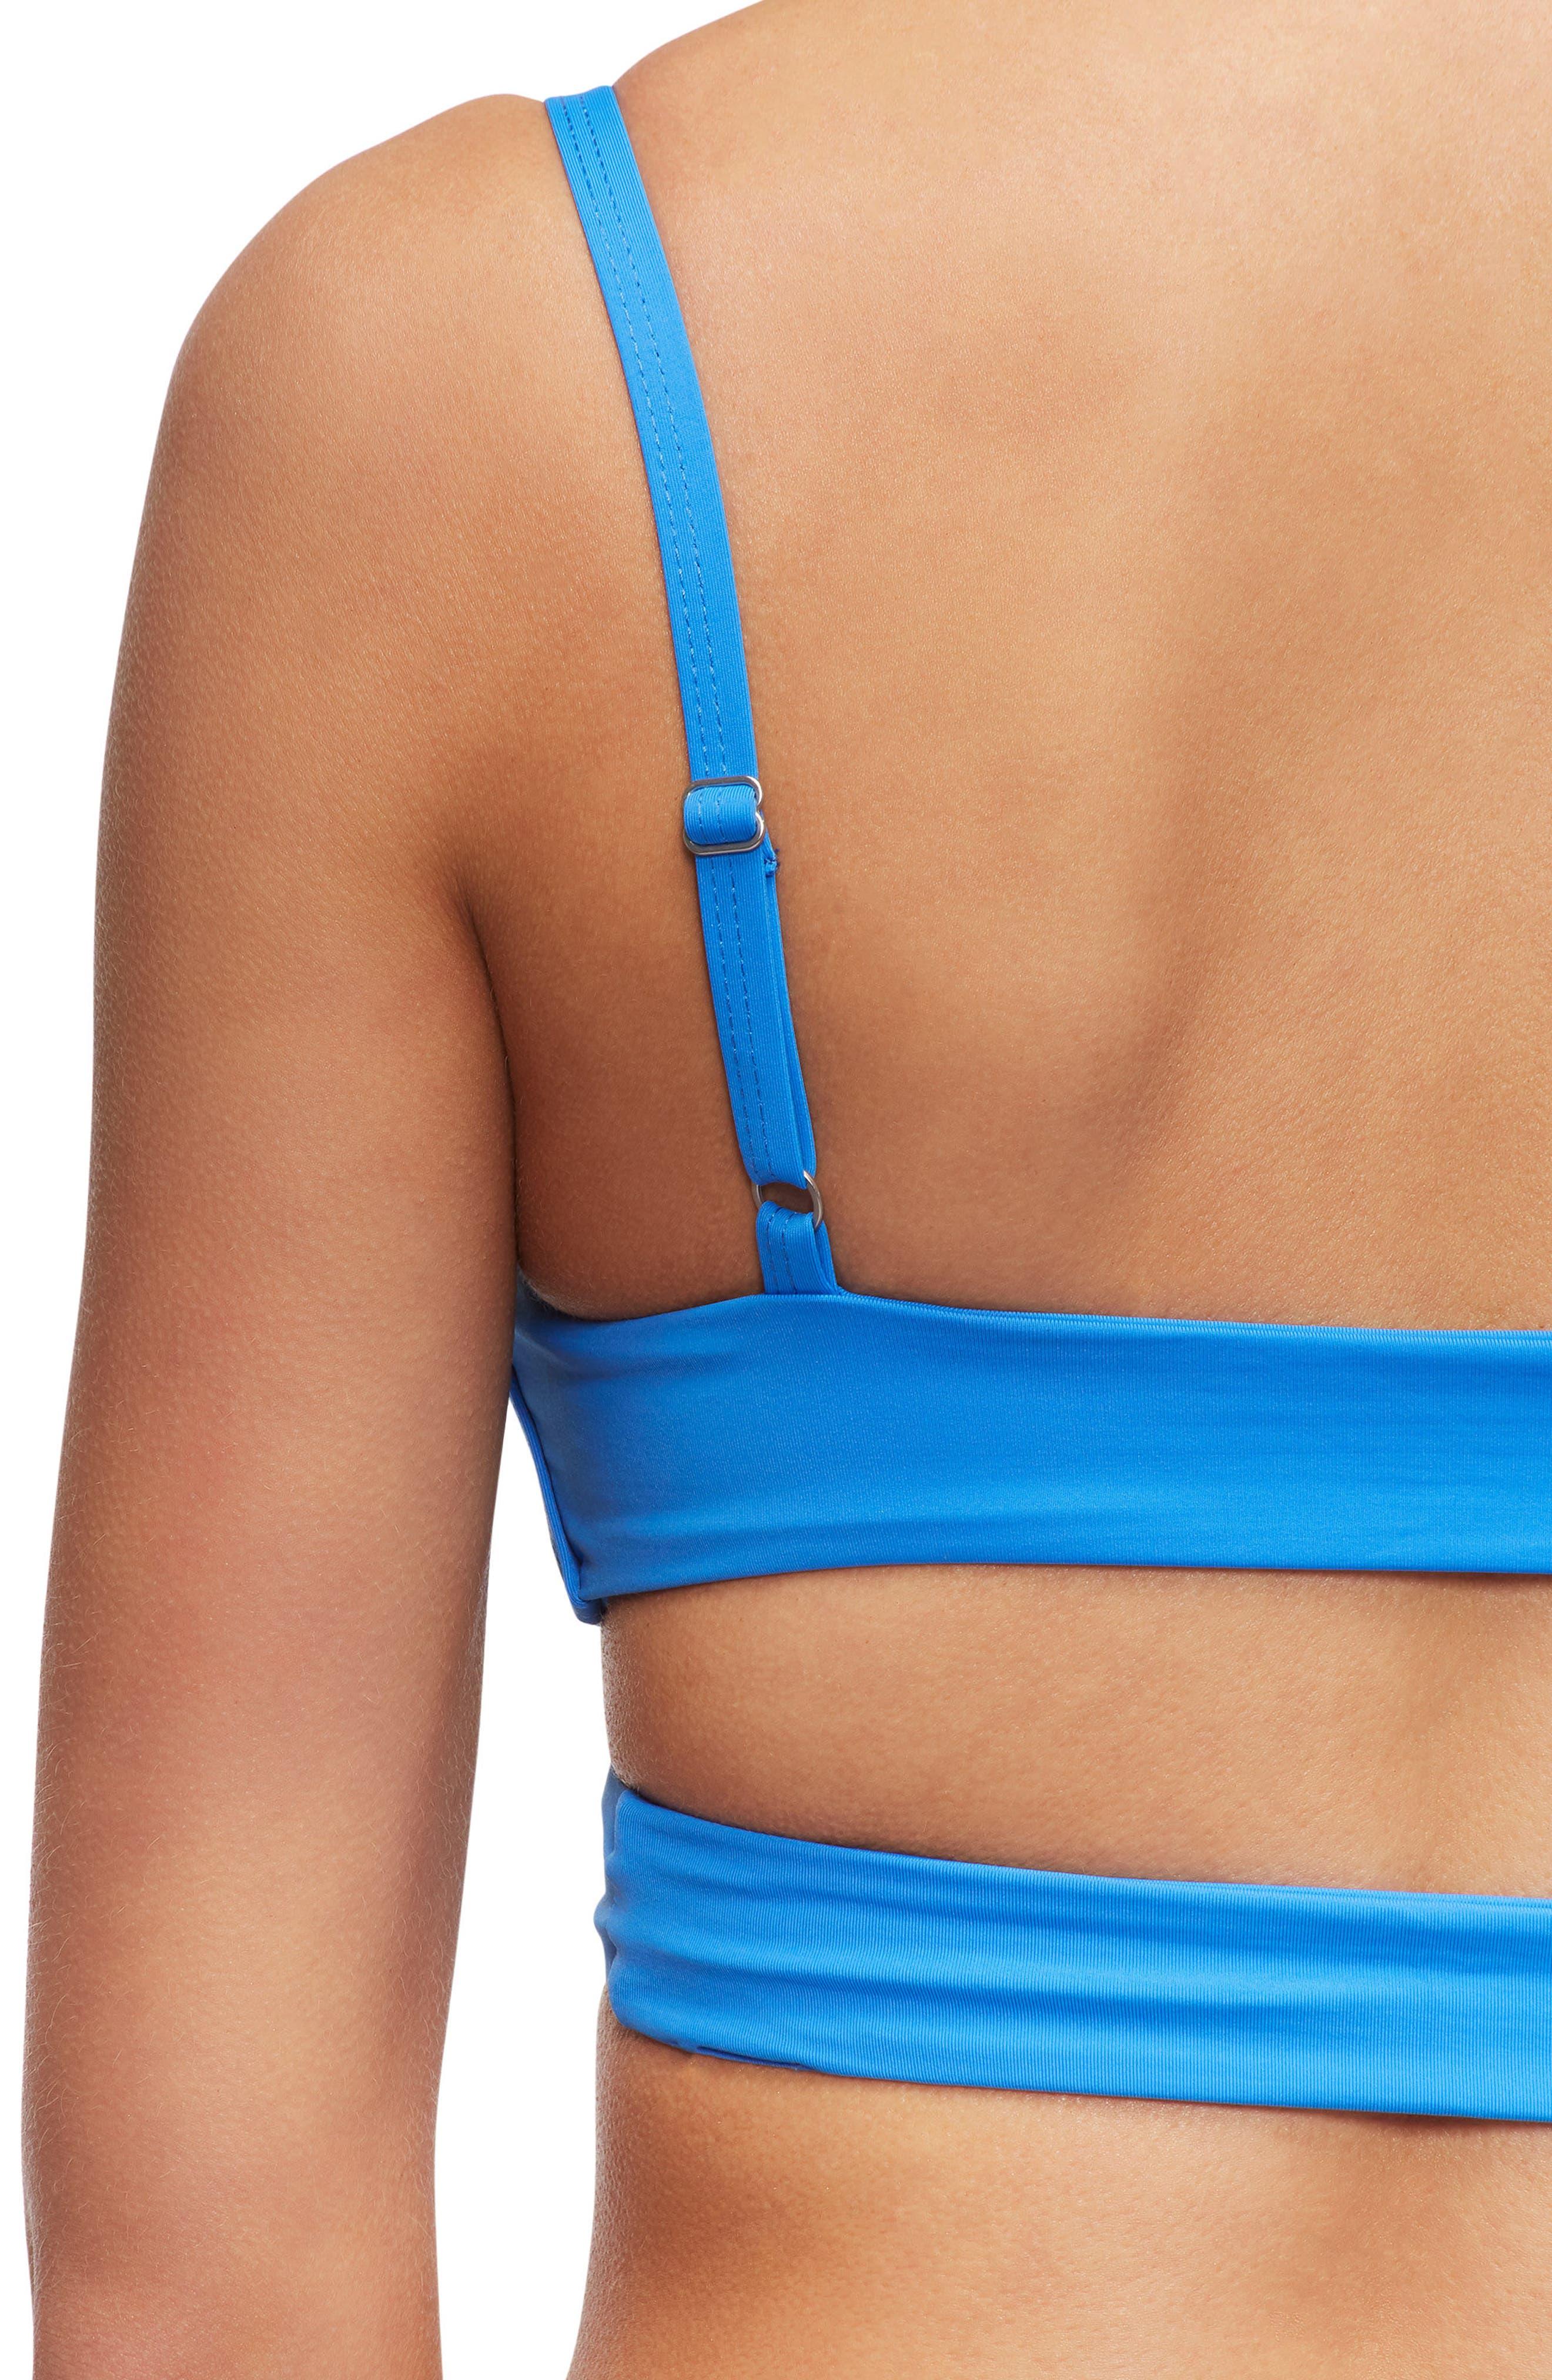 'Jessi' Cutout Triangle Bikini Top,                             Alternate thumbnail 4, color,                             French Blue